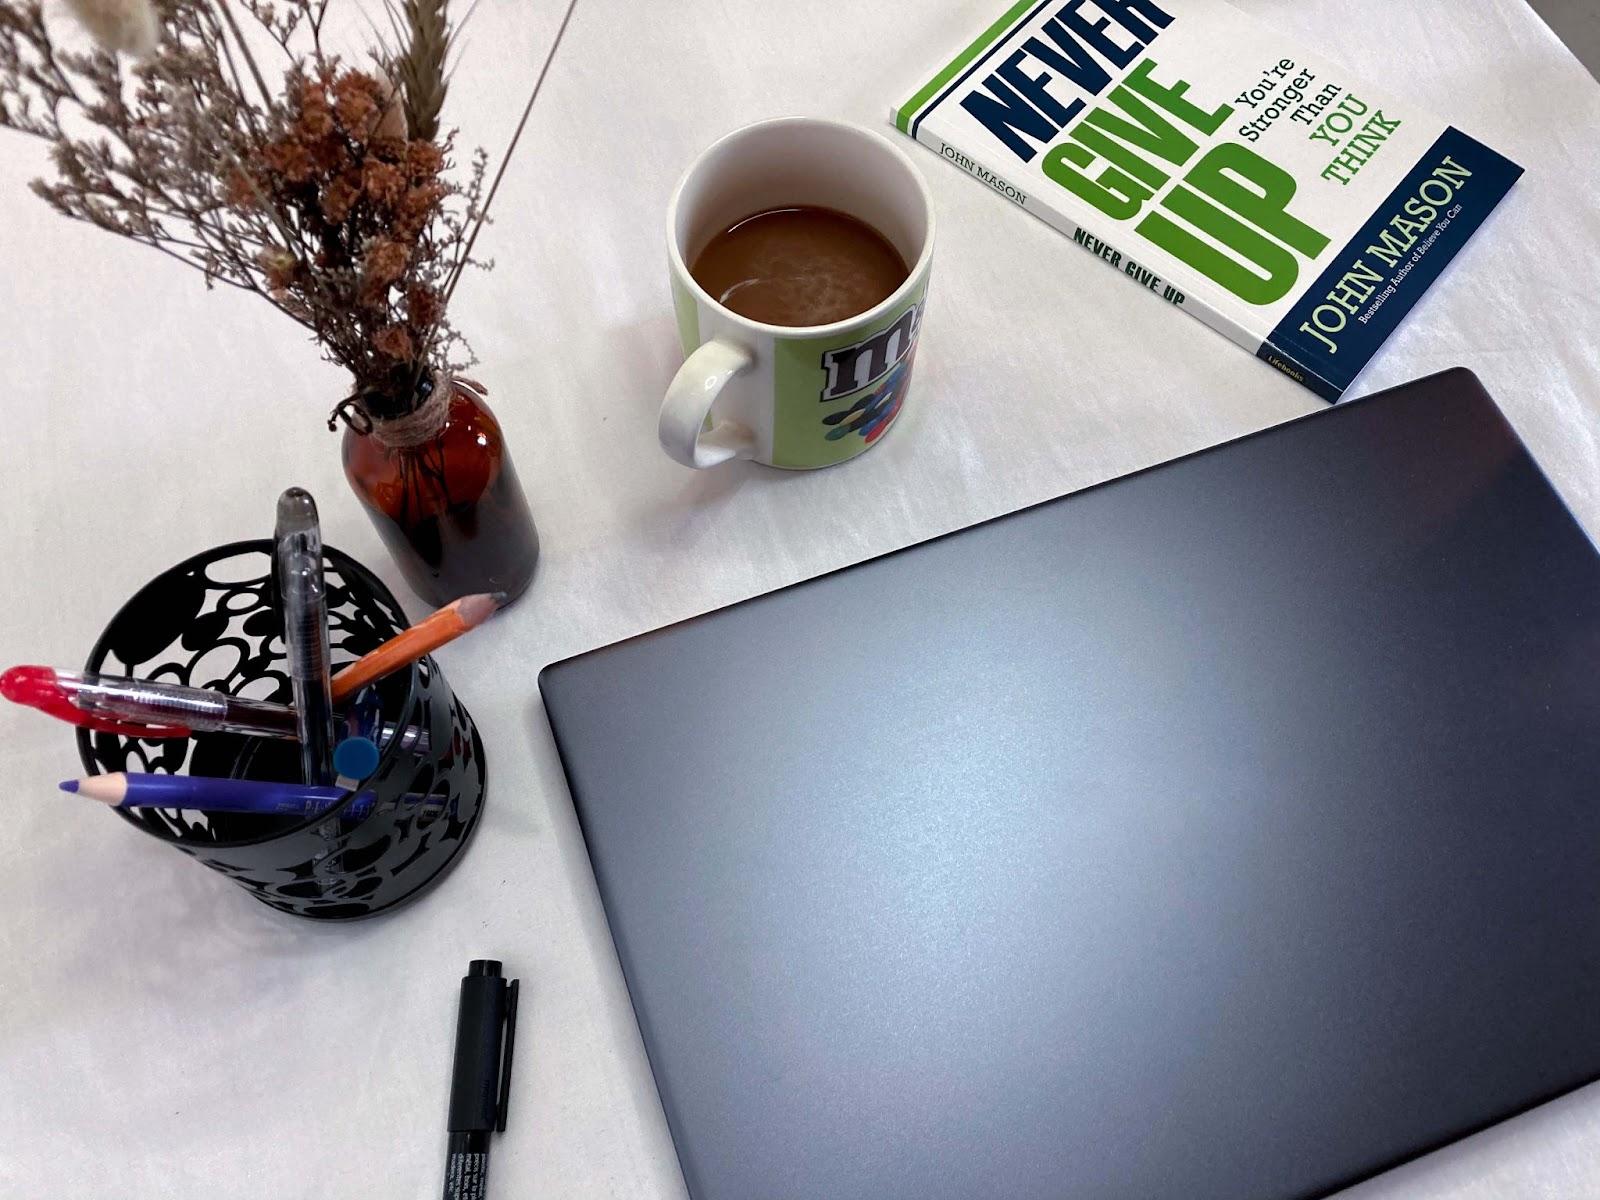 Image credit: My GRE Exam Preparation on Flickr